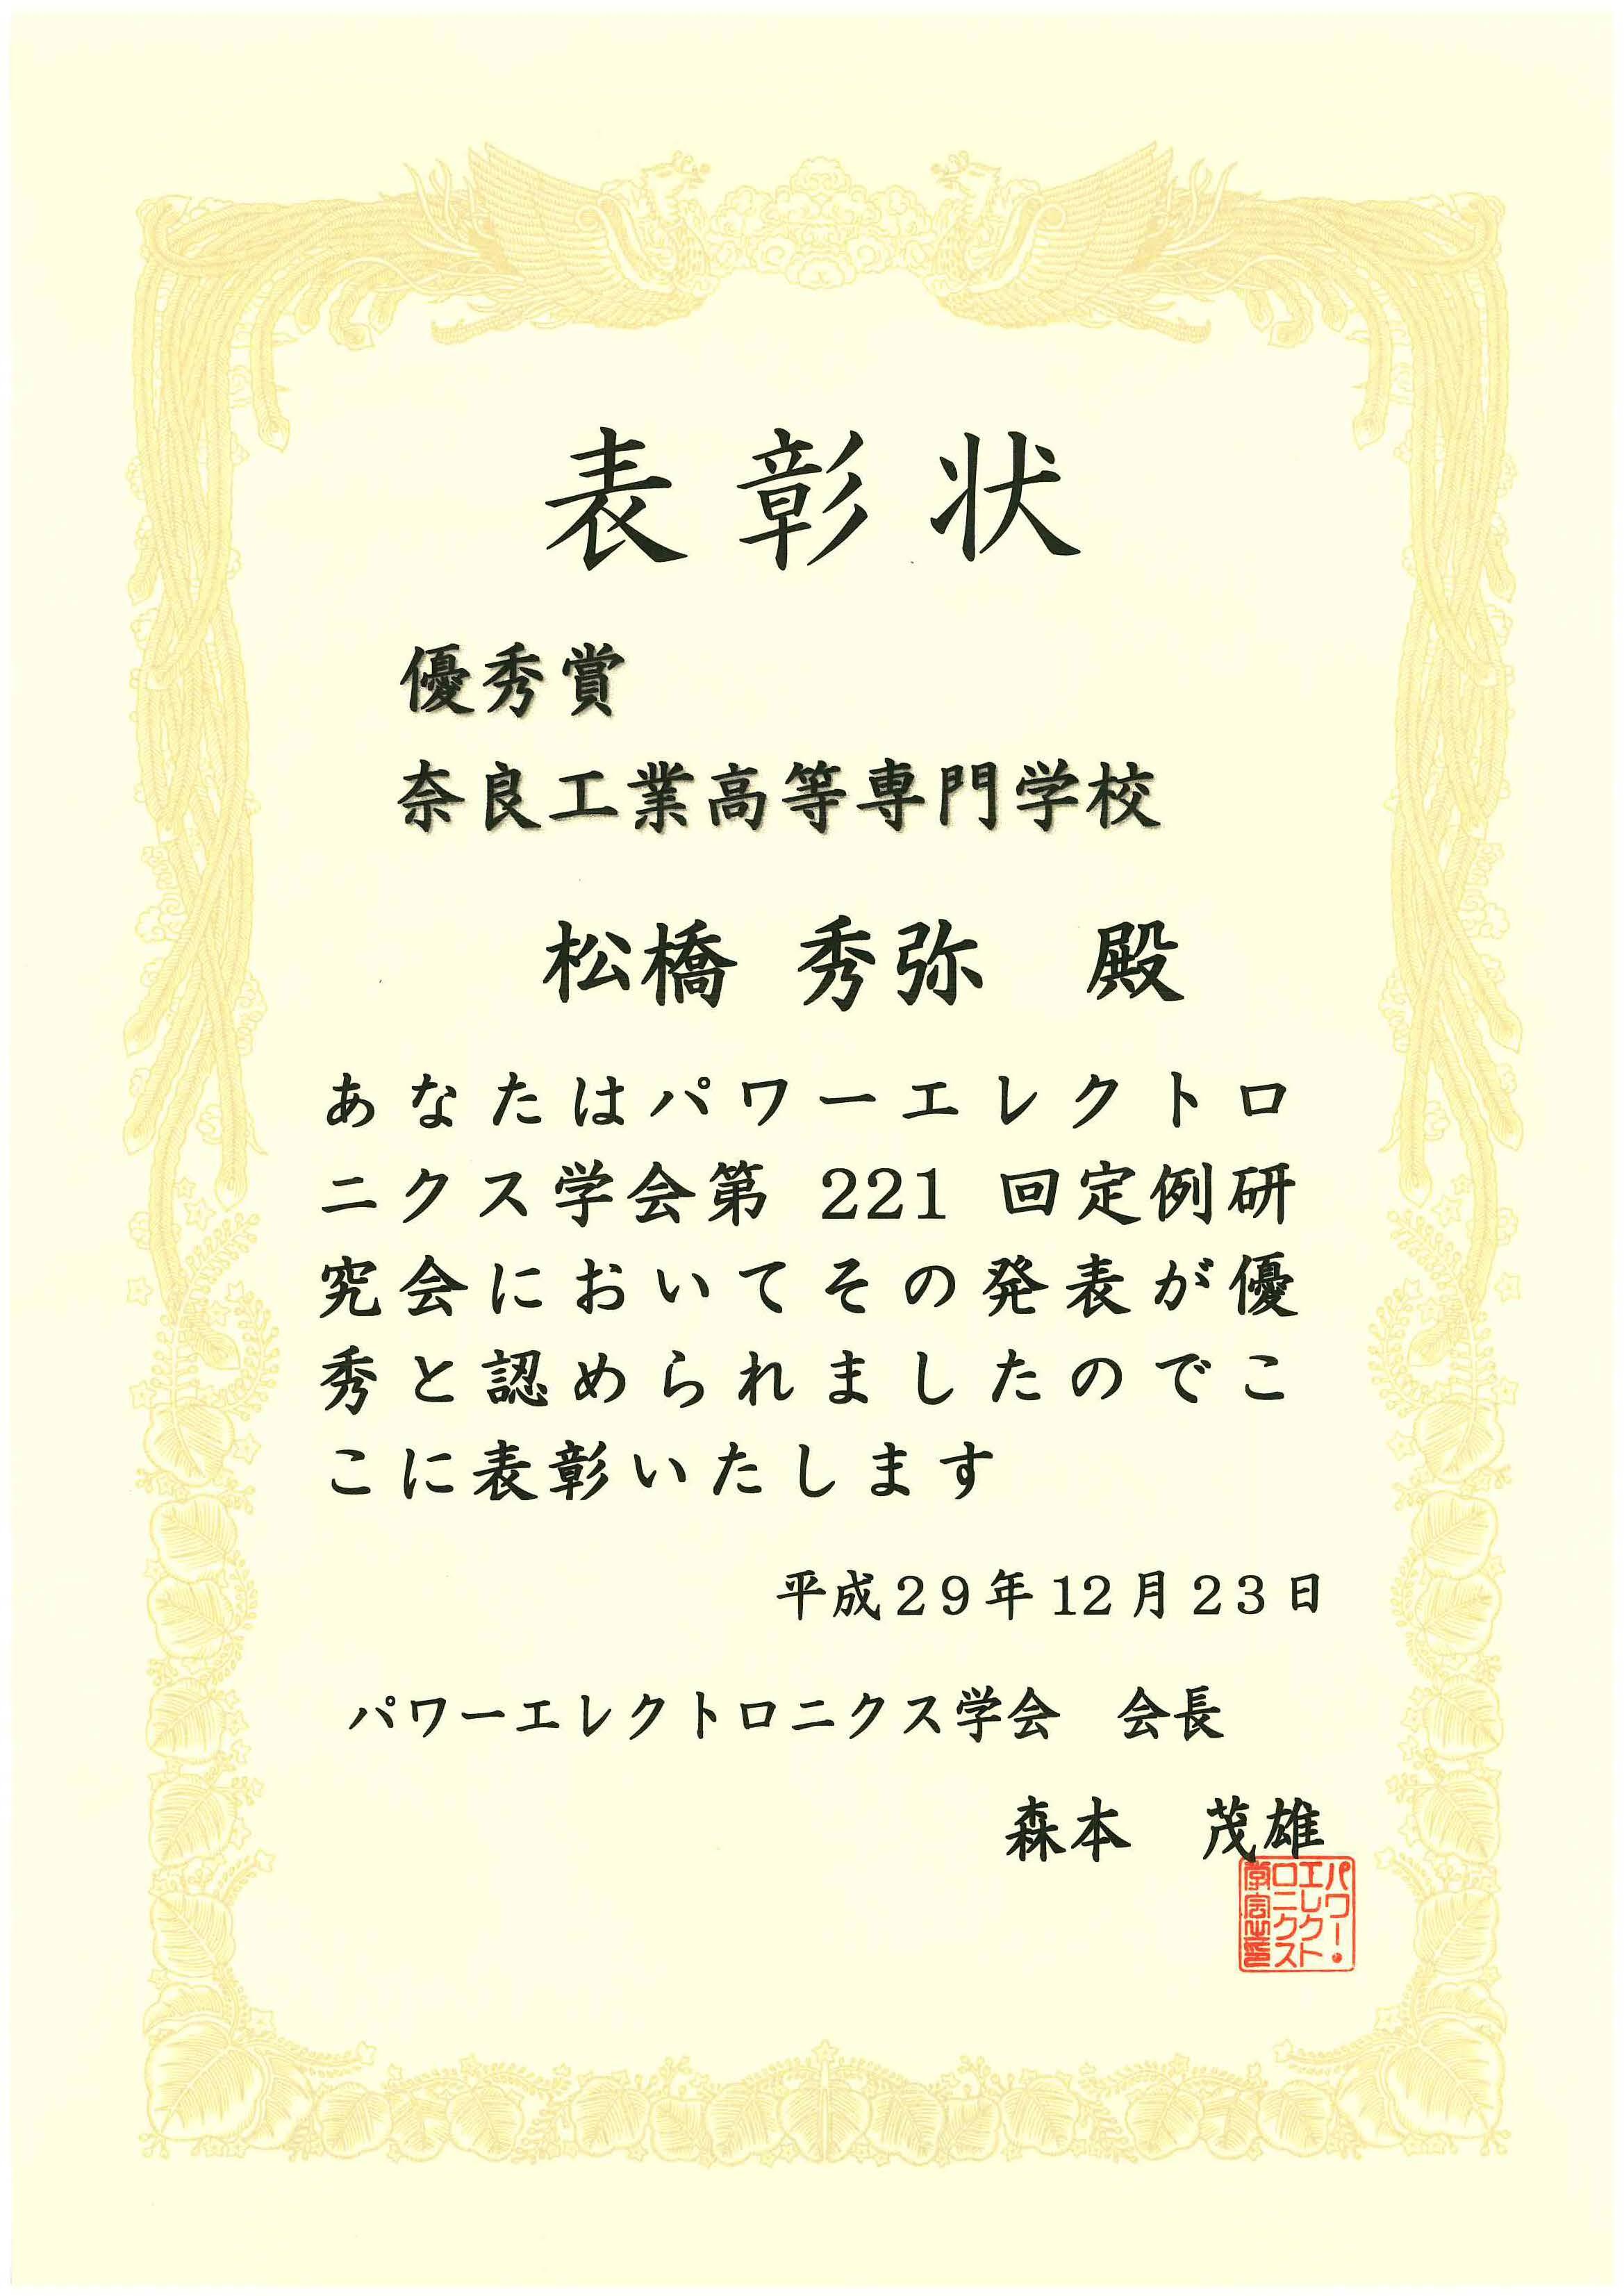 H29_PEsyojo_ページ_1.jpg